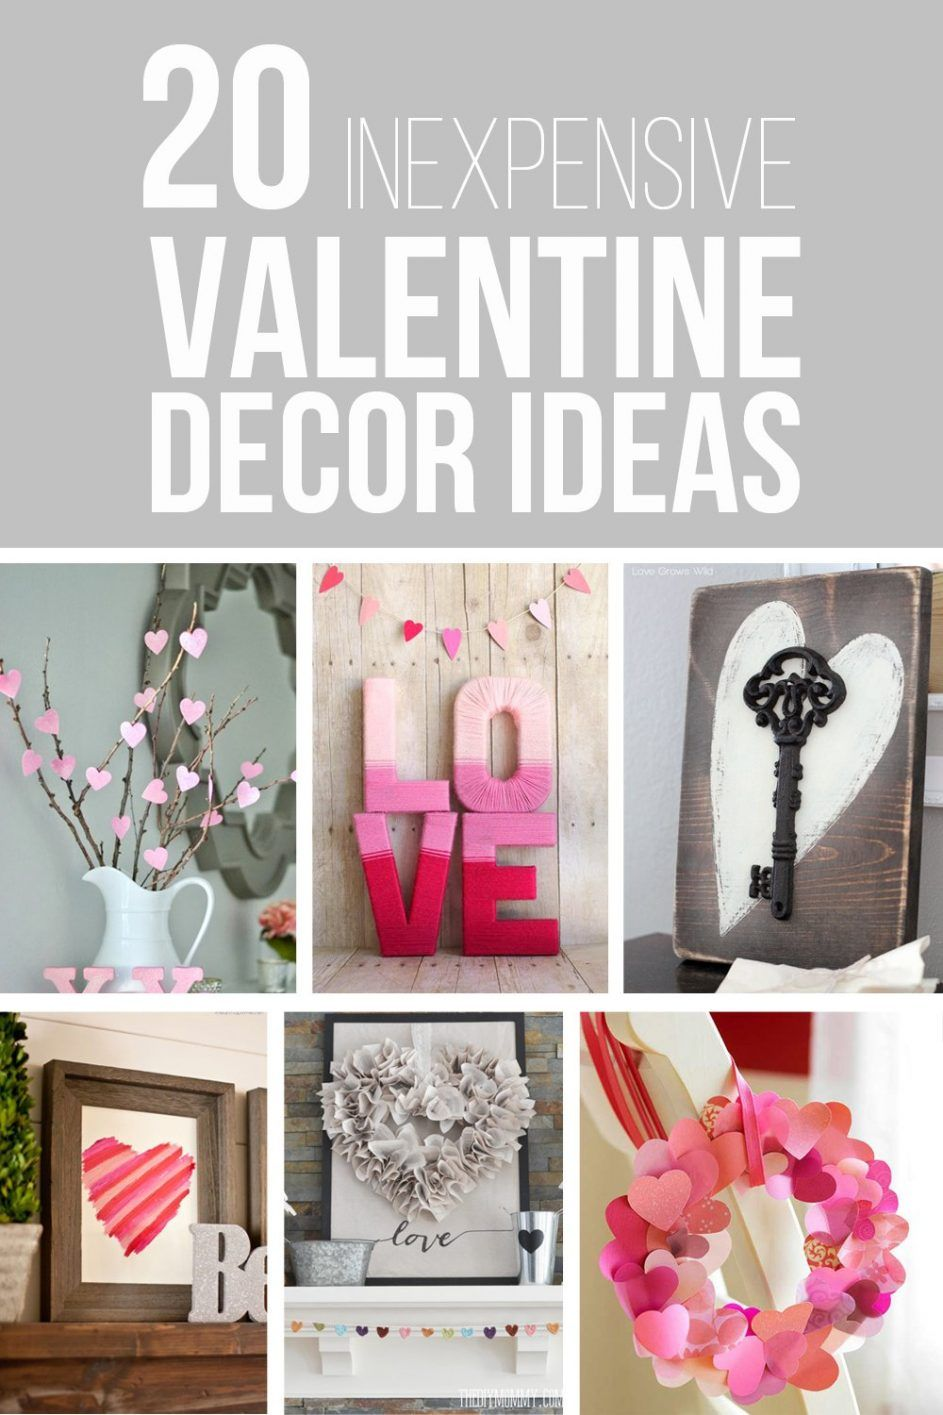 Design Ideas: Wondrous Diy Valentines Decor 3 Diy Valentine Room ...